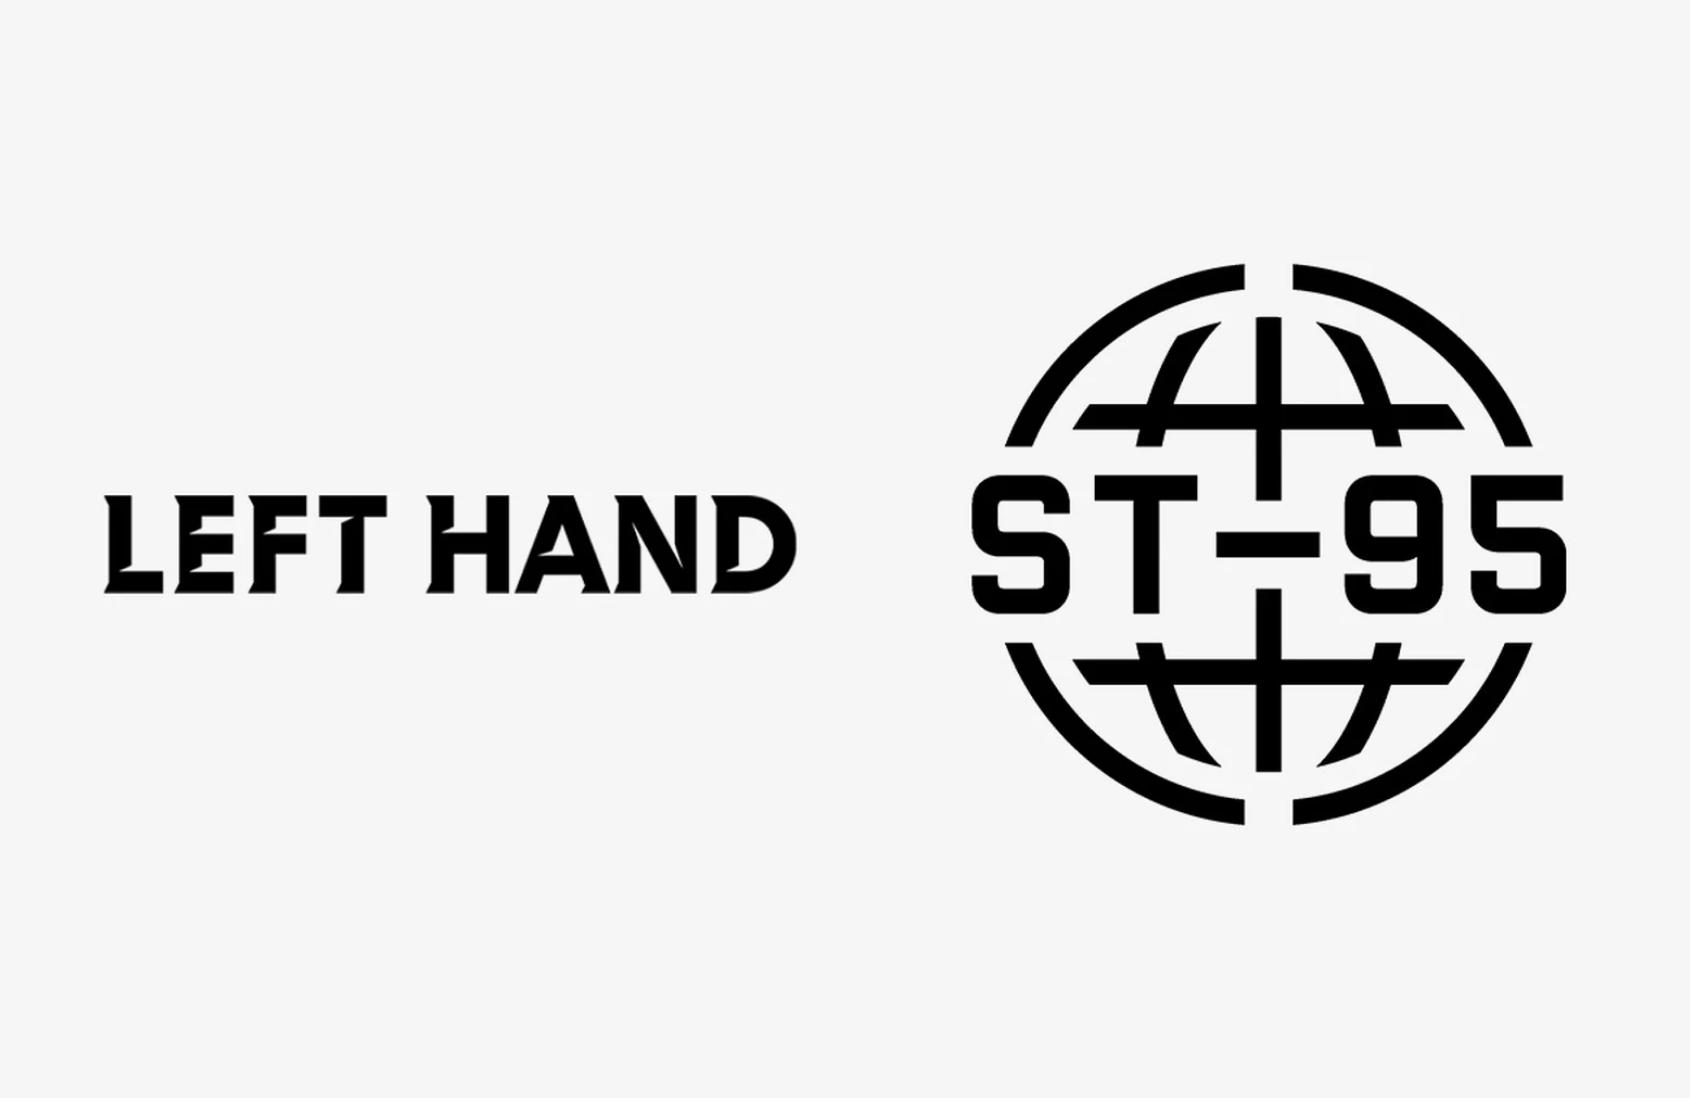 Stone Island 创始人20多年前创办的两个男装品牌将重新推出,由英国设计师 Christopher Raeburn 操刀